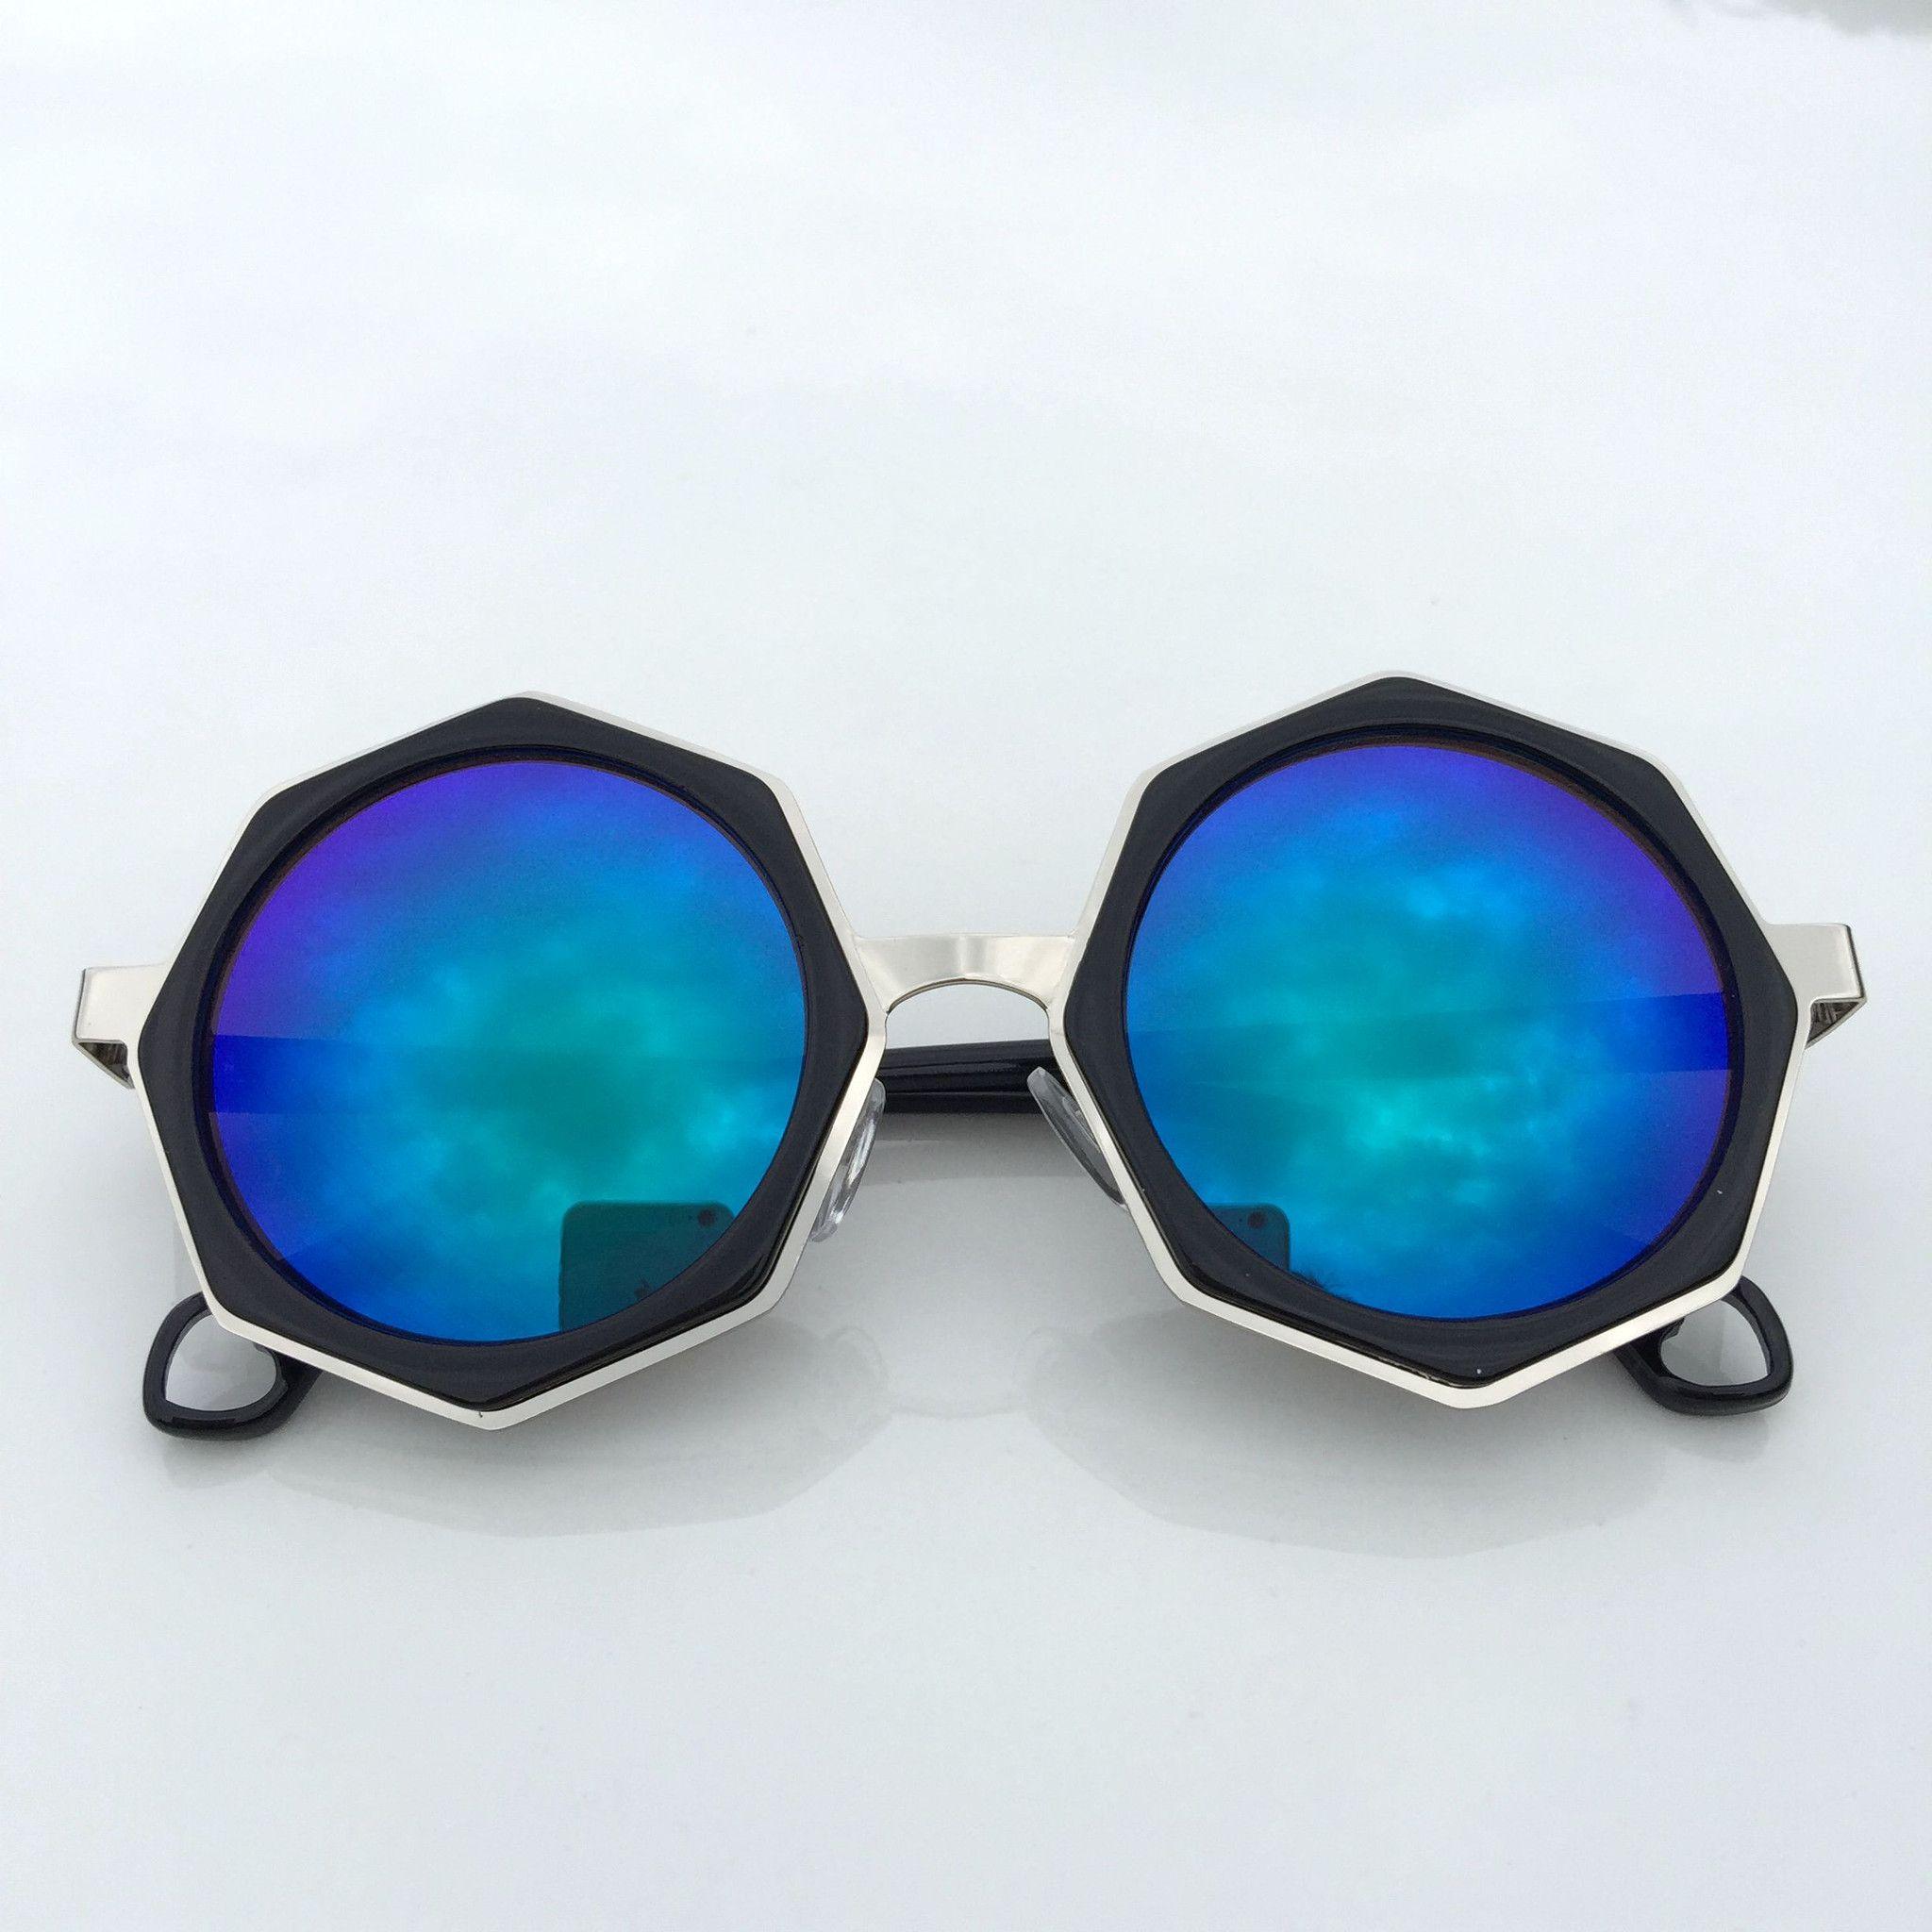 ccb928ac2b372 Unique Blue Steampunk Burning Man Polygon Retro Sunglasses Goggle Shades  Sunnies for Women Men